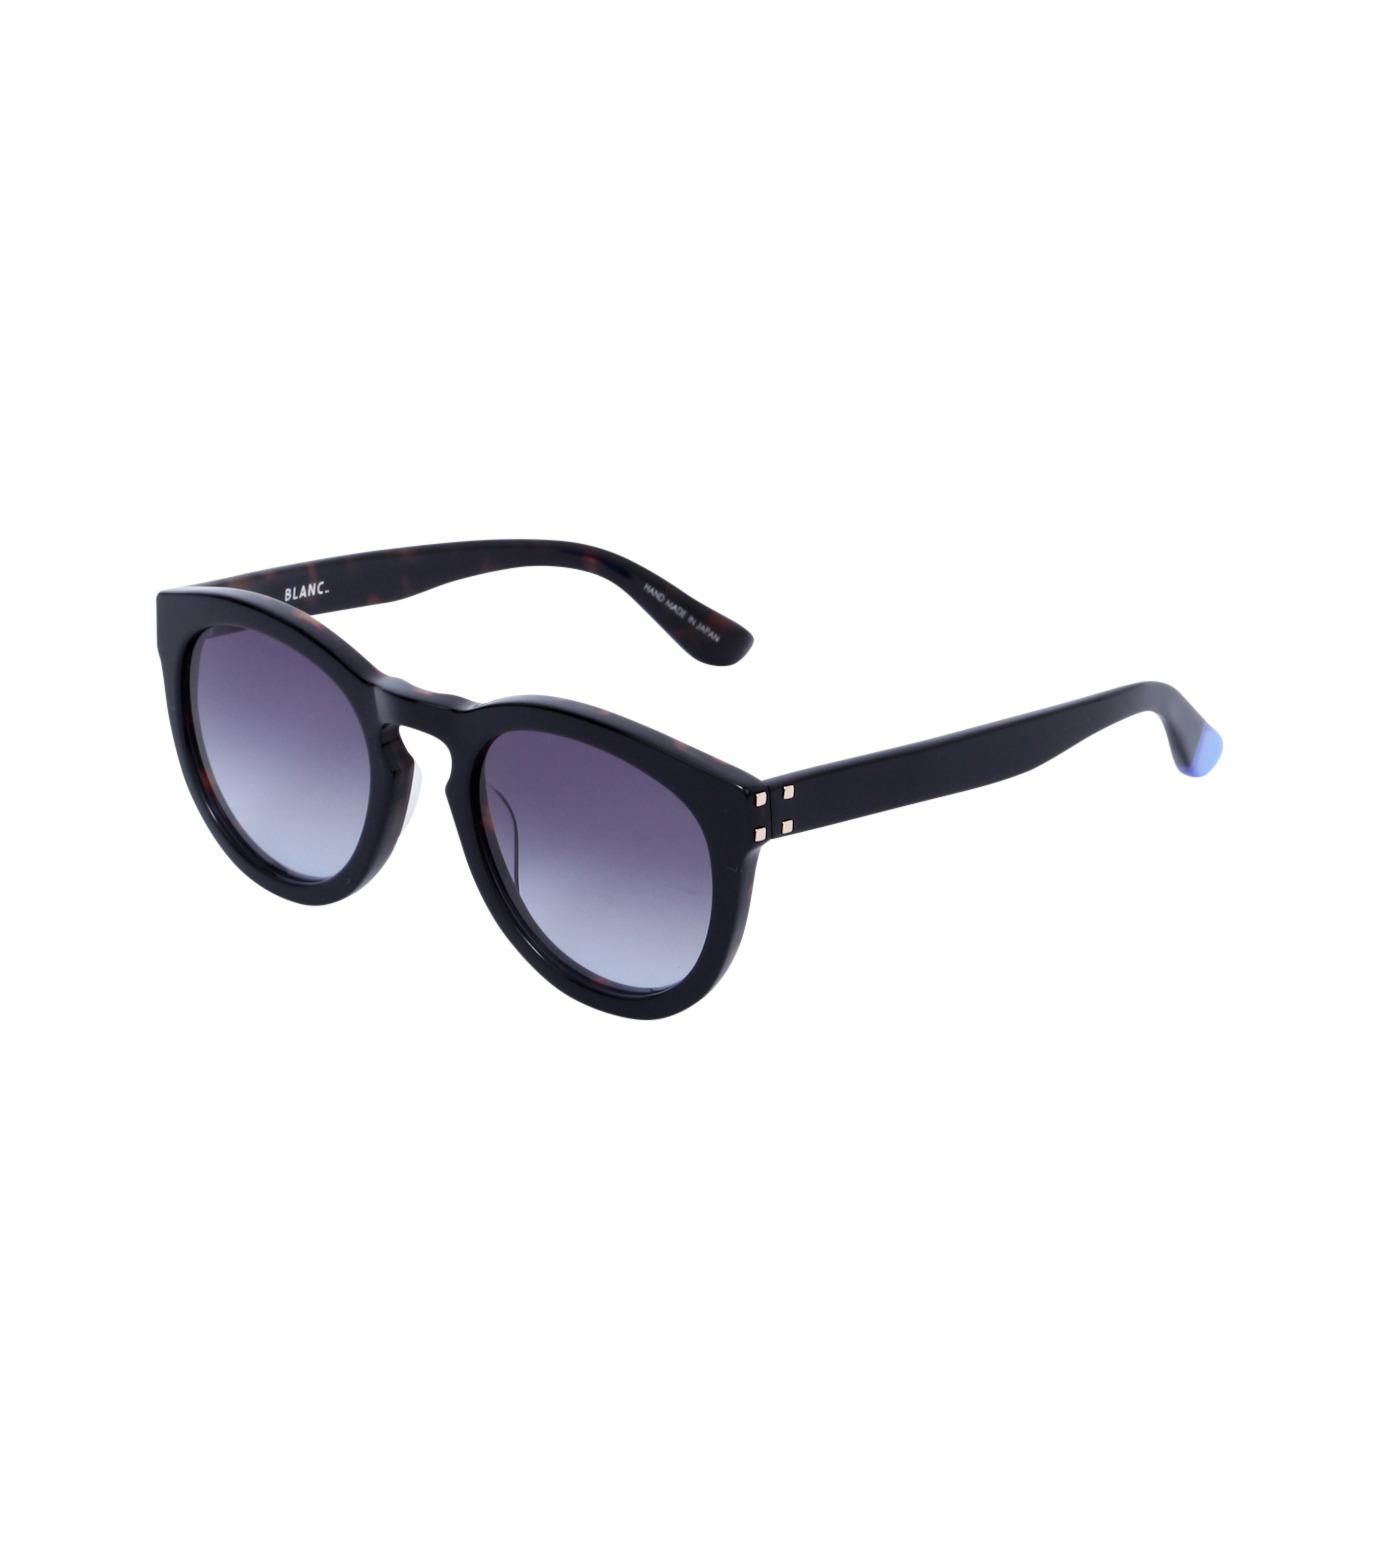 BLANC(ブラン)のThick Frame Sunglass-BLACK(アイウェア/eyewear)-B0007-N-13 拡大詳細画像1